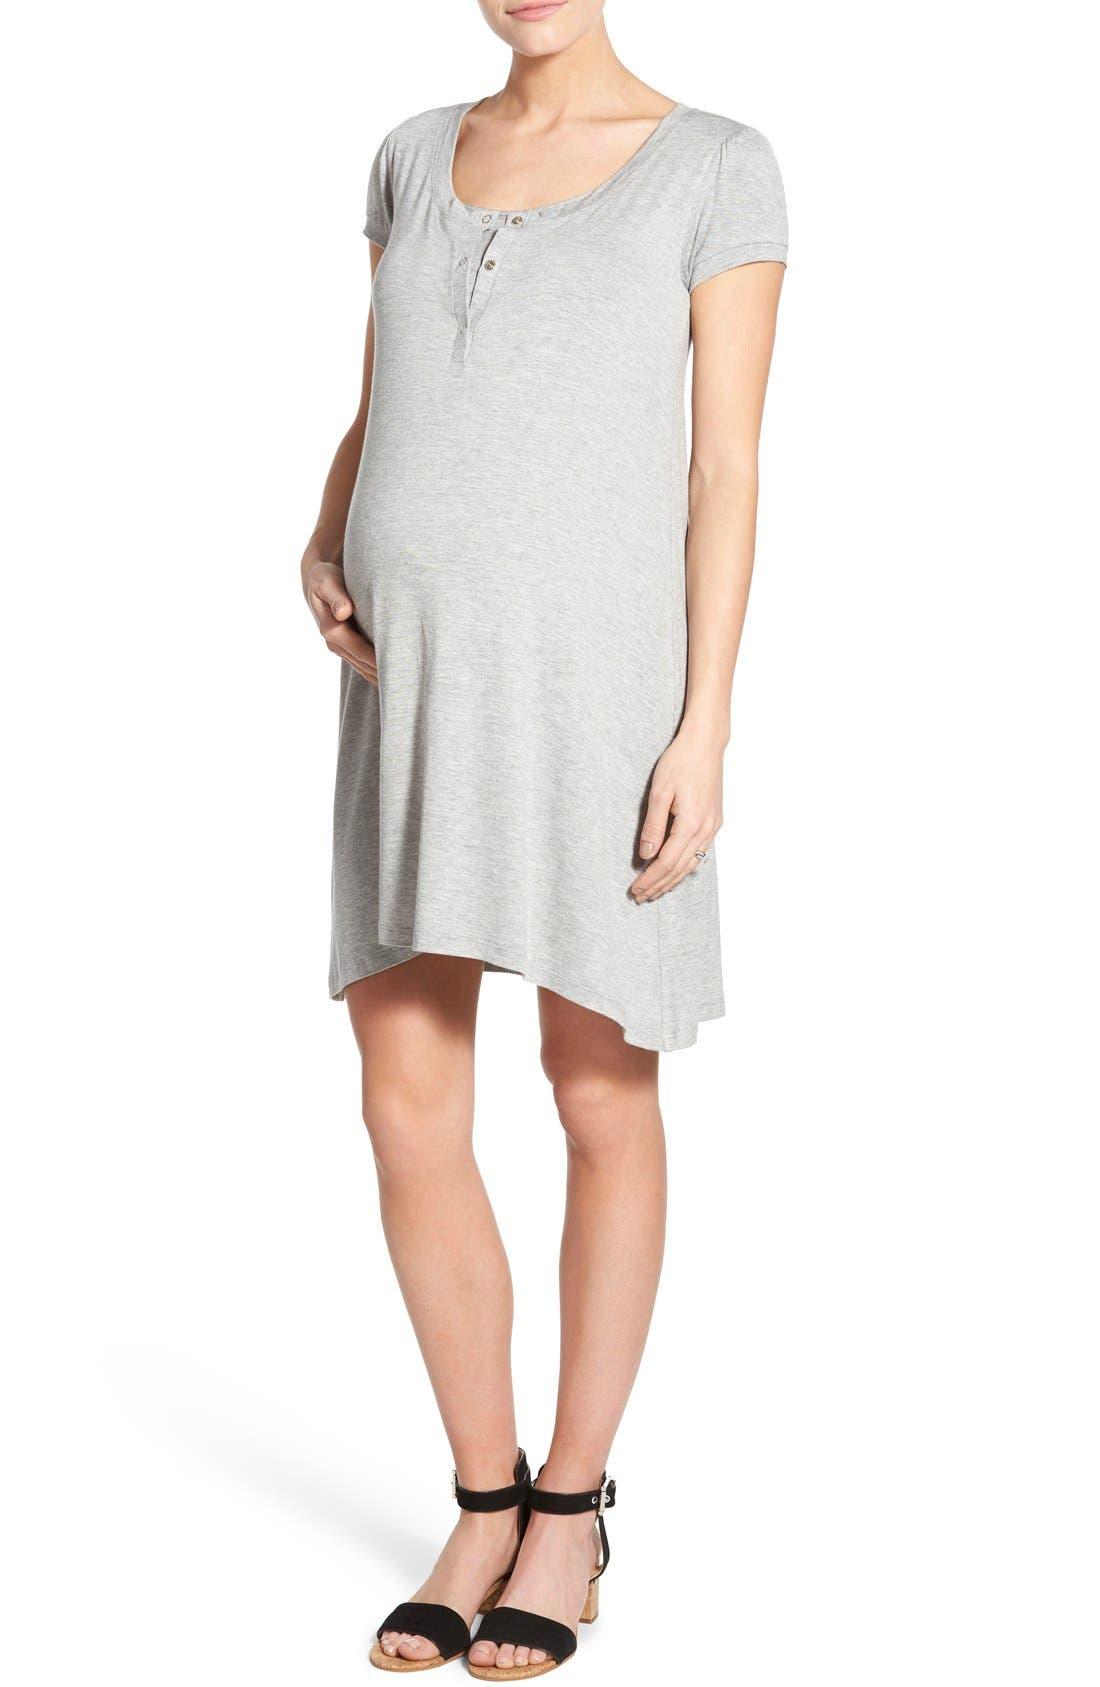 Main Image - LAB40 'Poppy' Maternity/Nursing Swing Dress